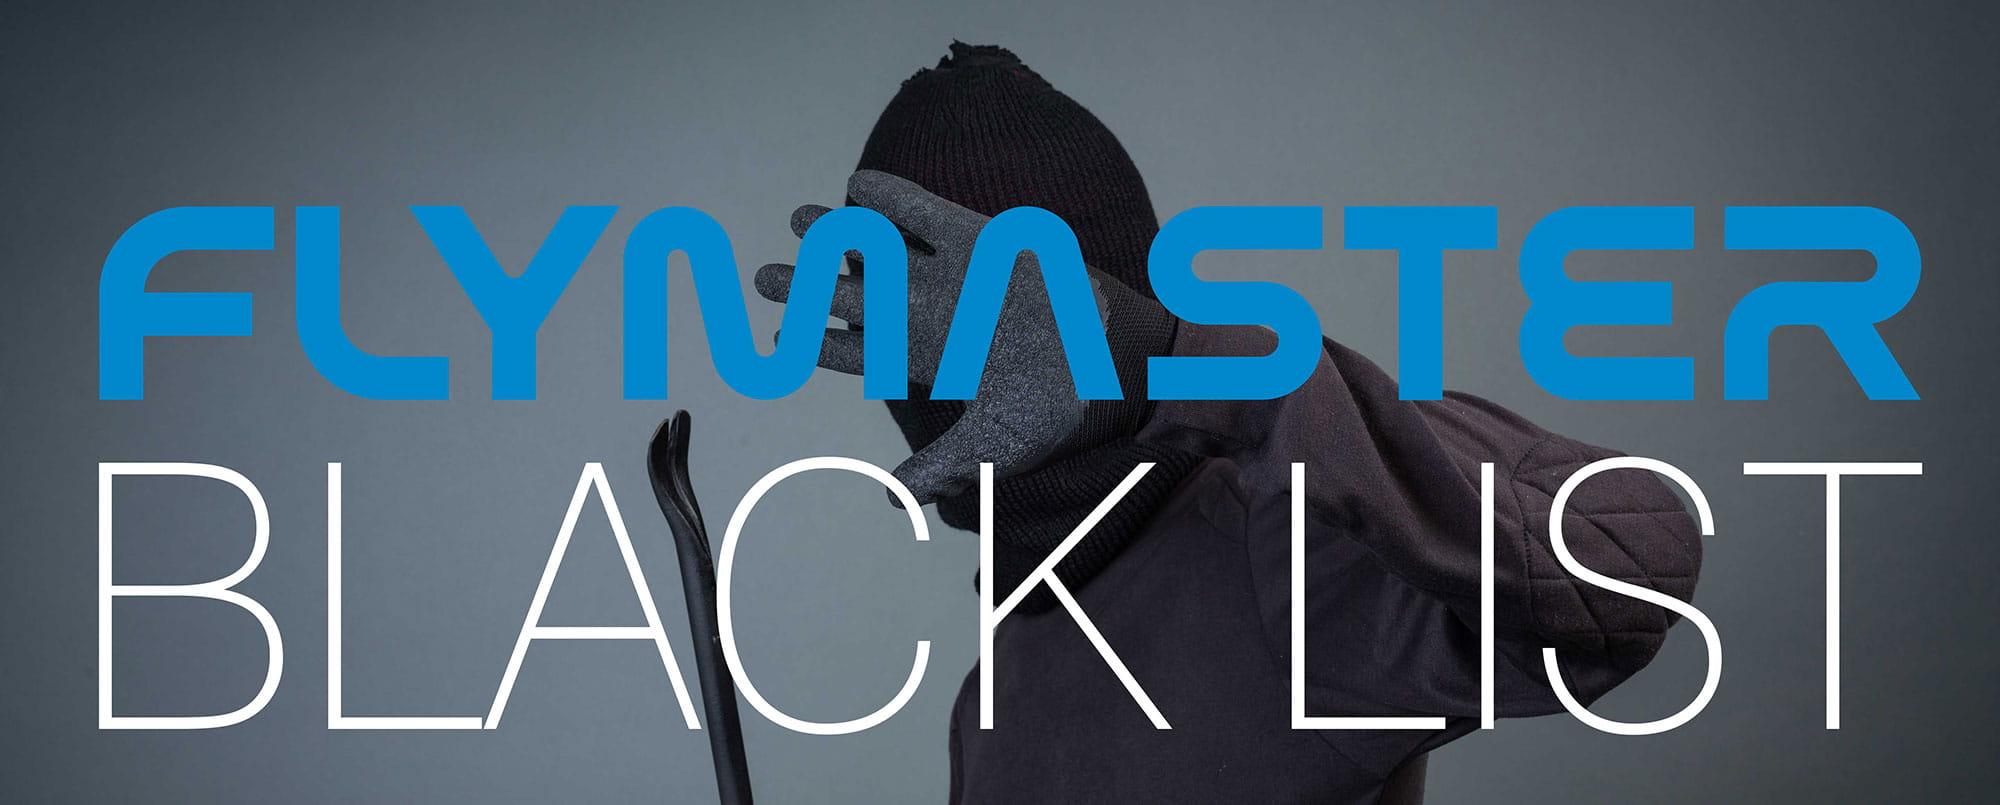 Black-List-banner